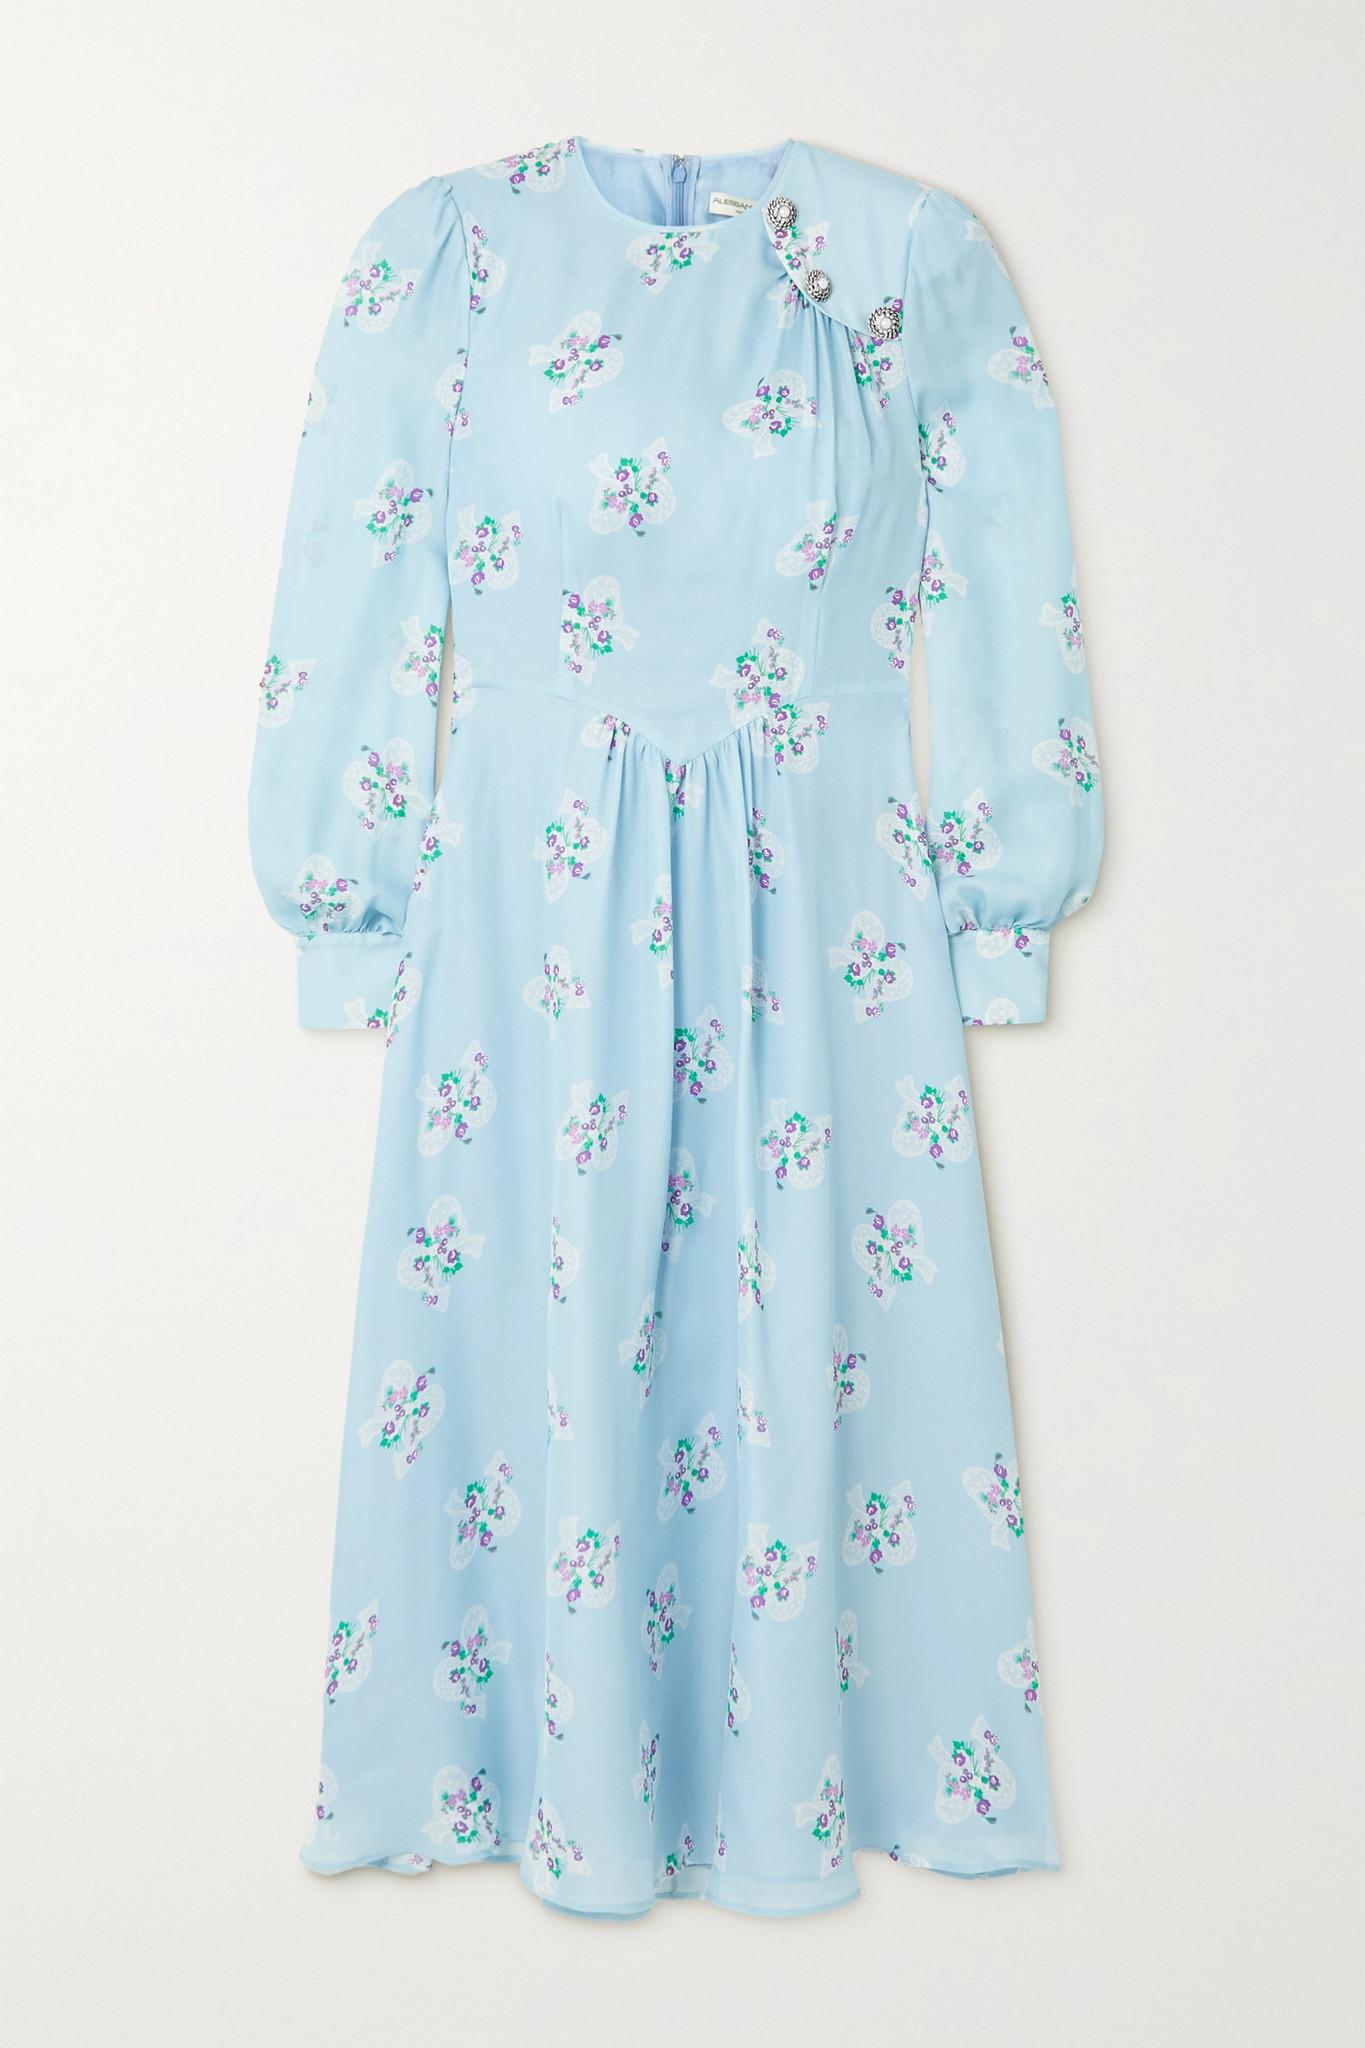 ALESSANDRA RICH - Button-embellished Floral-print Silk Crepe De Chine Midi Dress - Blue - IT36